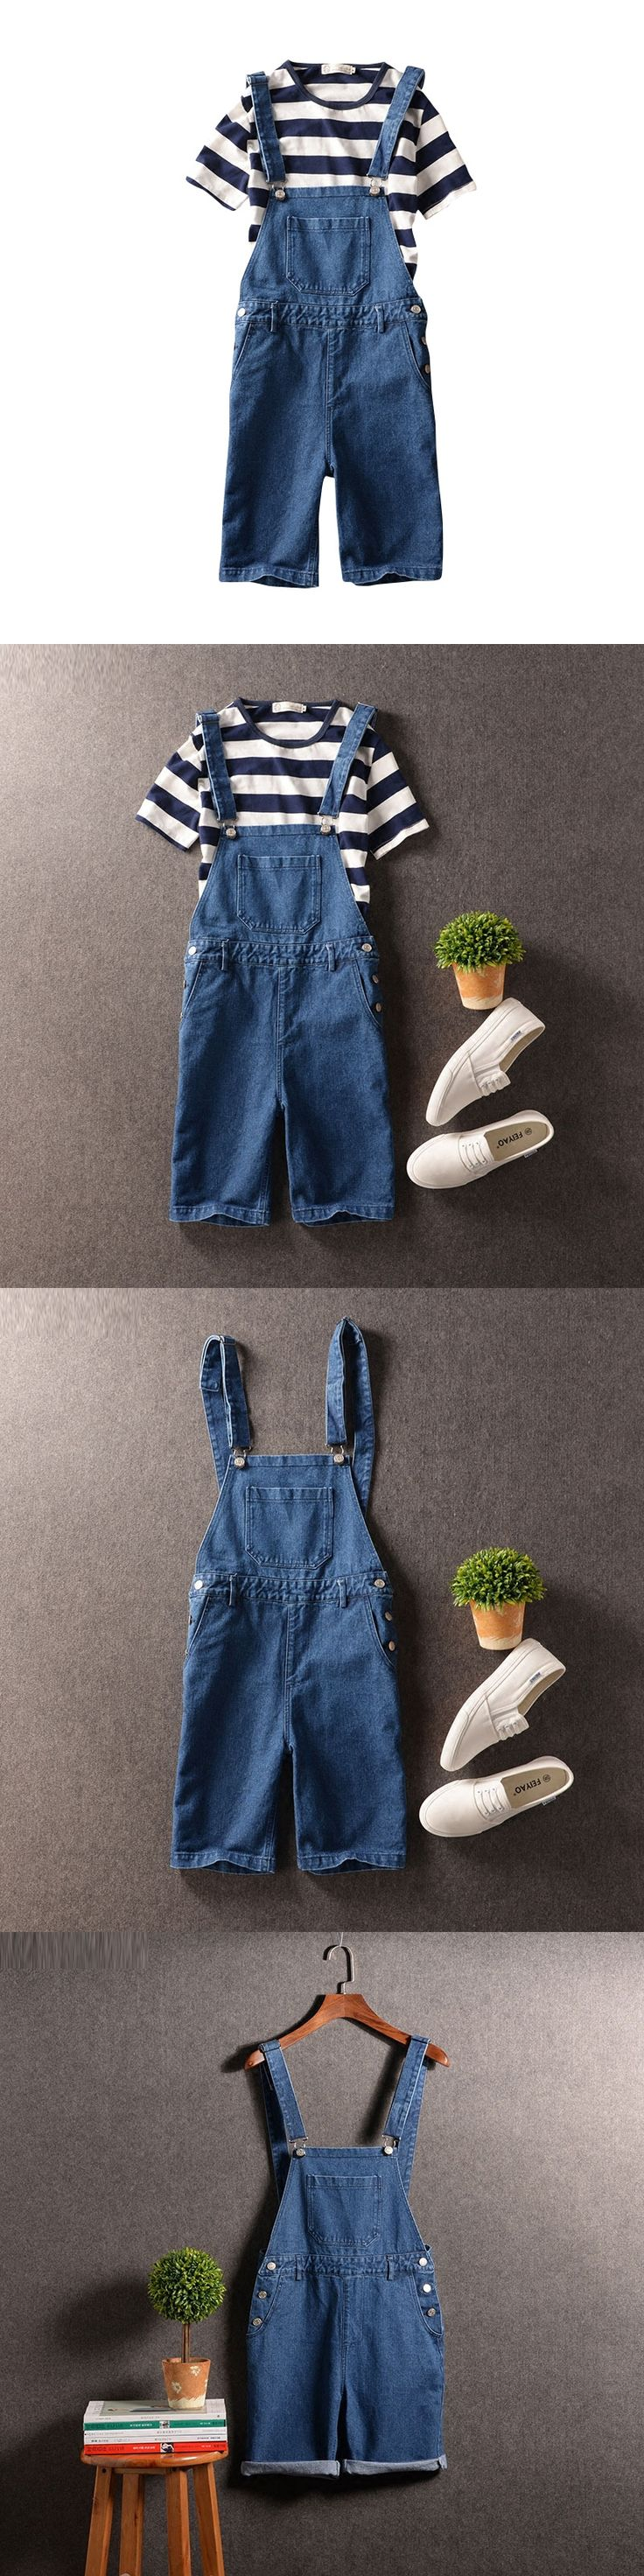 2016 New Jeans Jumpsuits For Men Denim Overalls Men Blue Jean Shorts Denim Bib Overall Shorts For Men